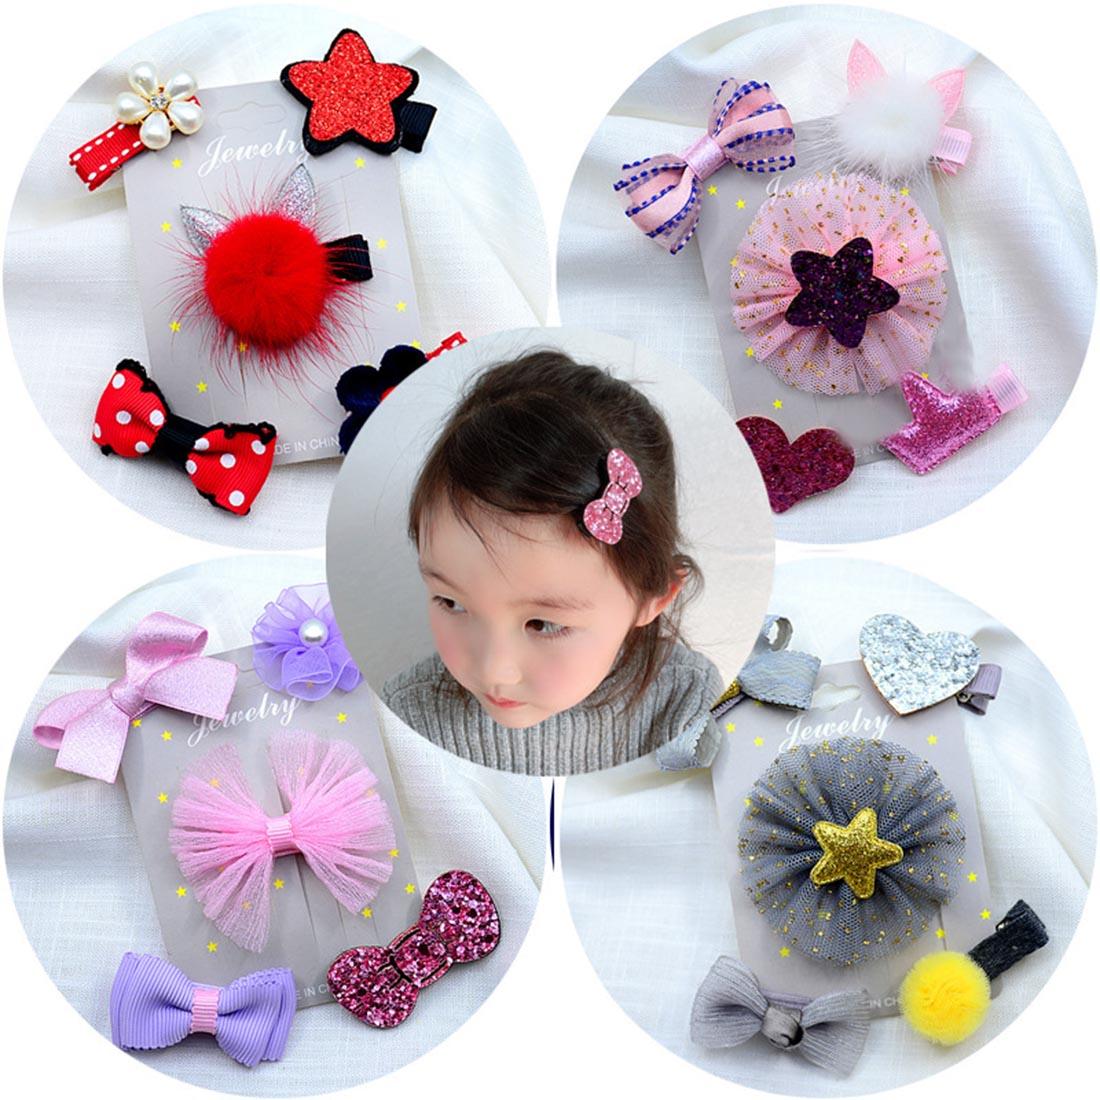 1 set of 5pcs fabric cartoon bow hairpin card holder Kit birthday gift box